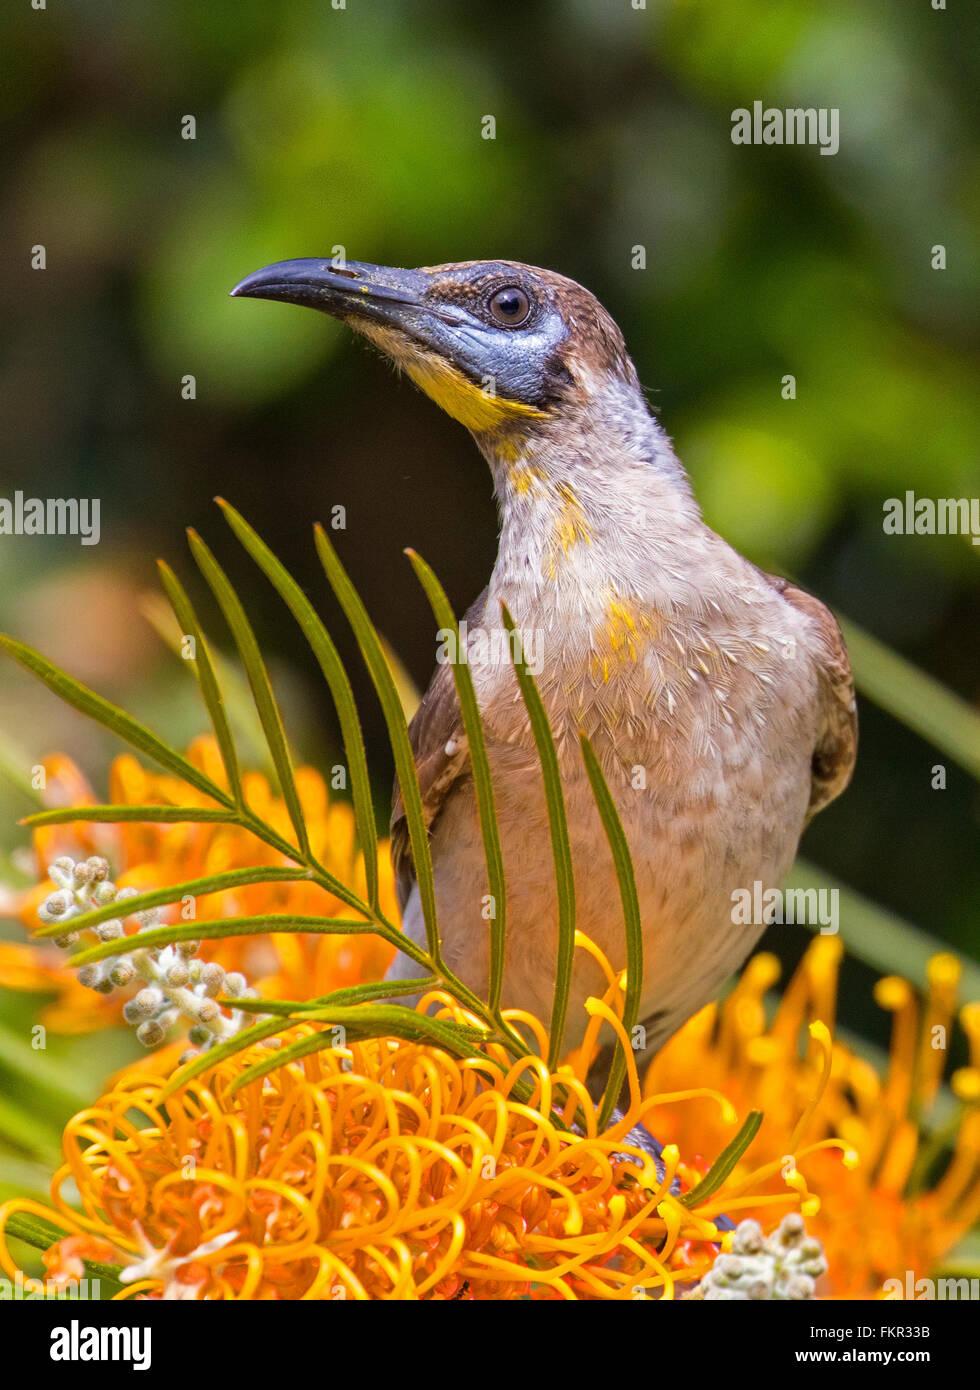 Australian brownHoneyeater, Bird feeding on nectar from a grevillia flower - Stock Image